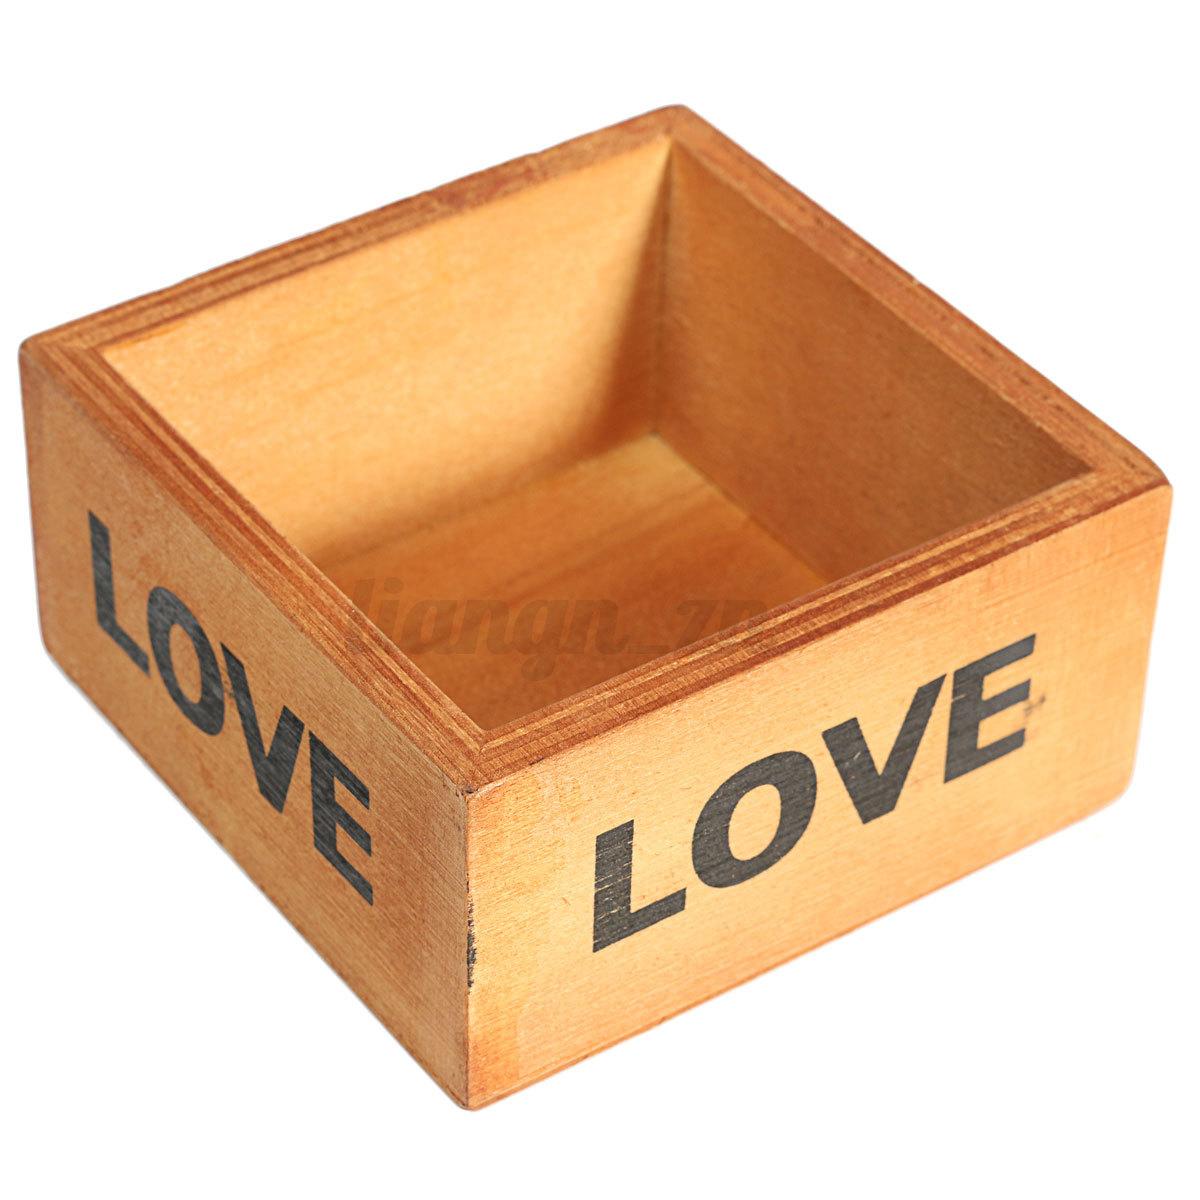 Bo te rangement bureau organisateur en bois cosm tique - Rangement bureau bois ...